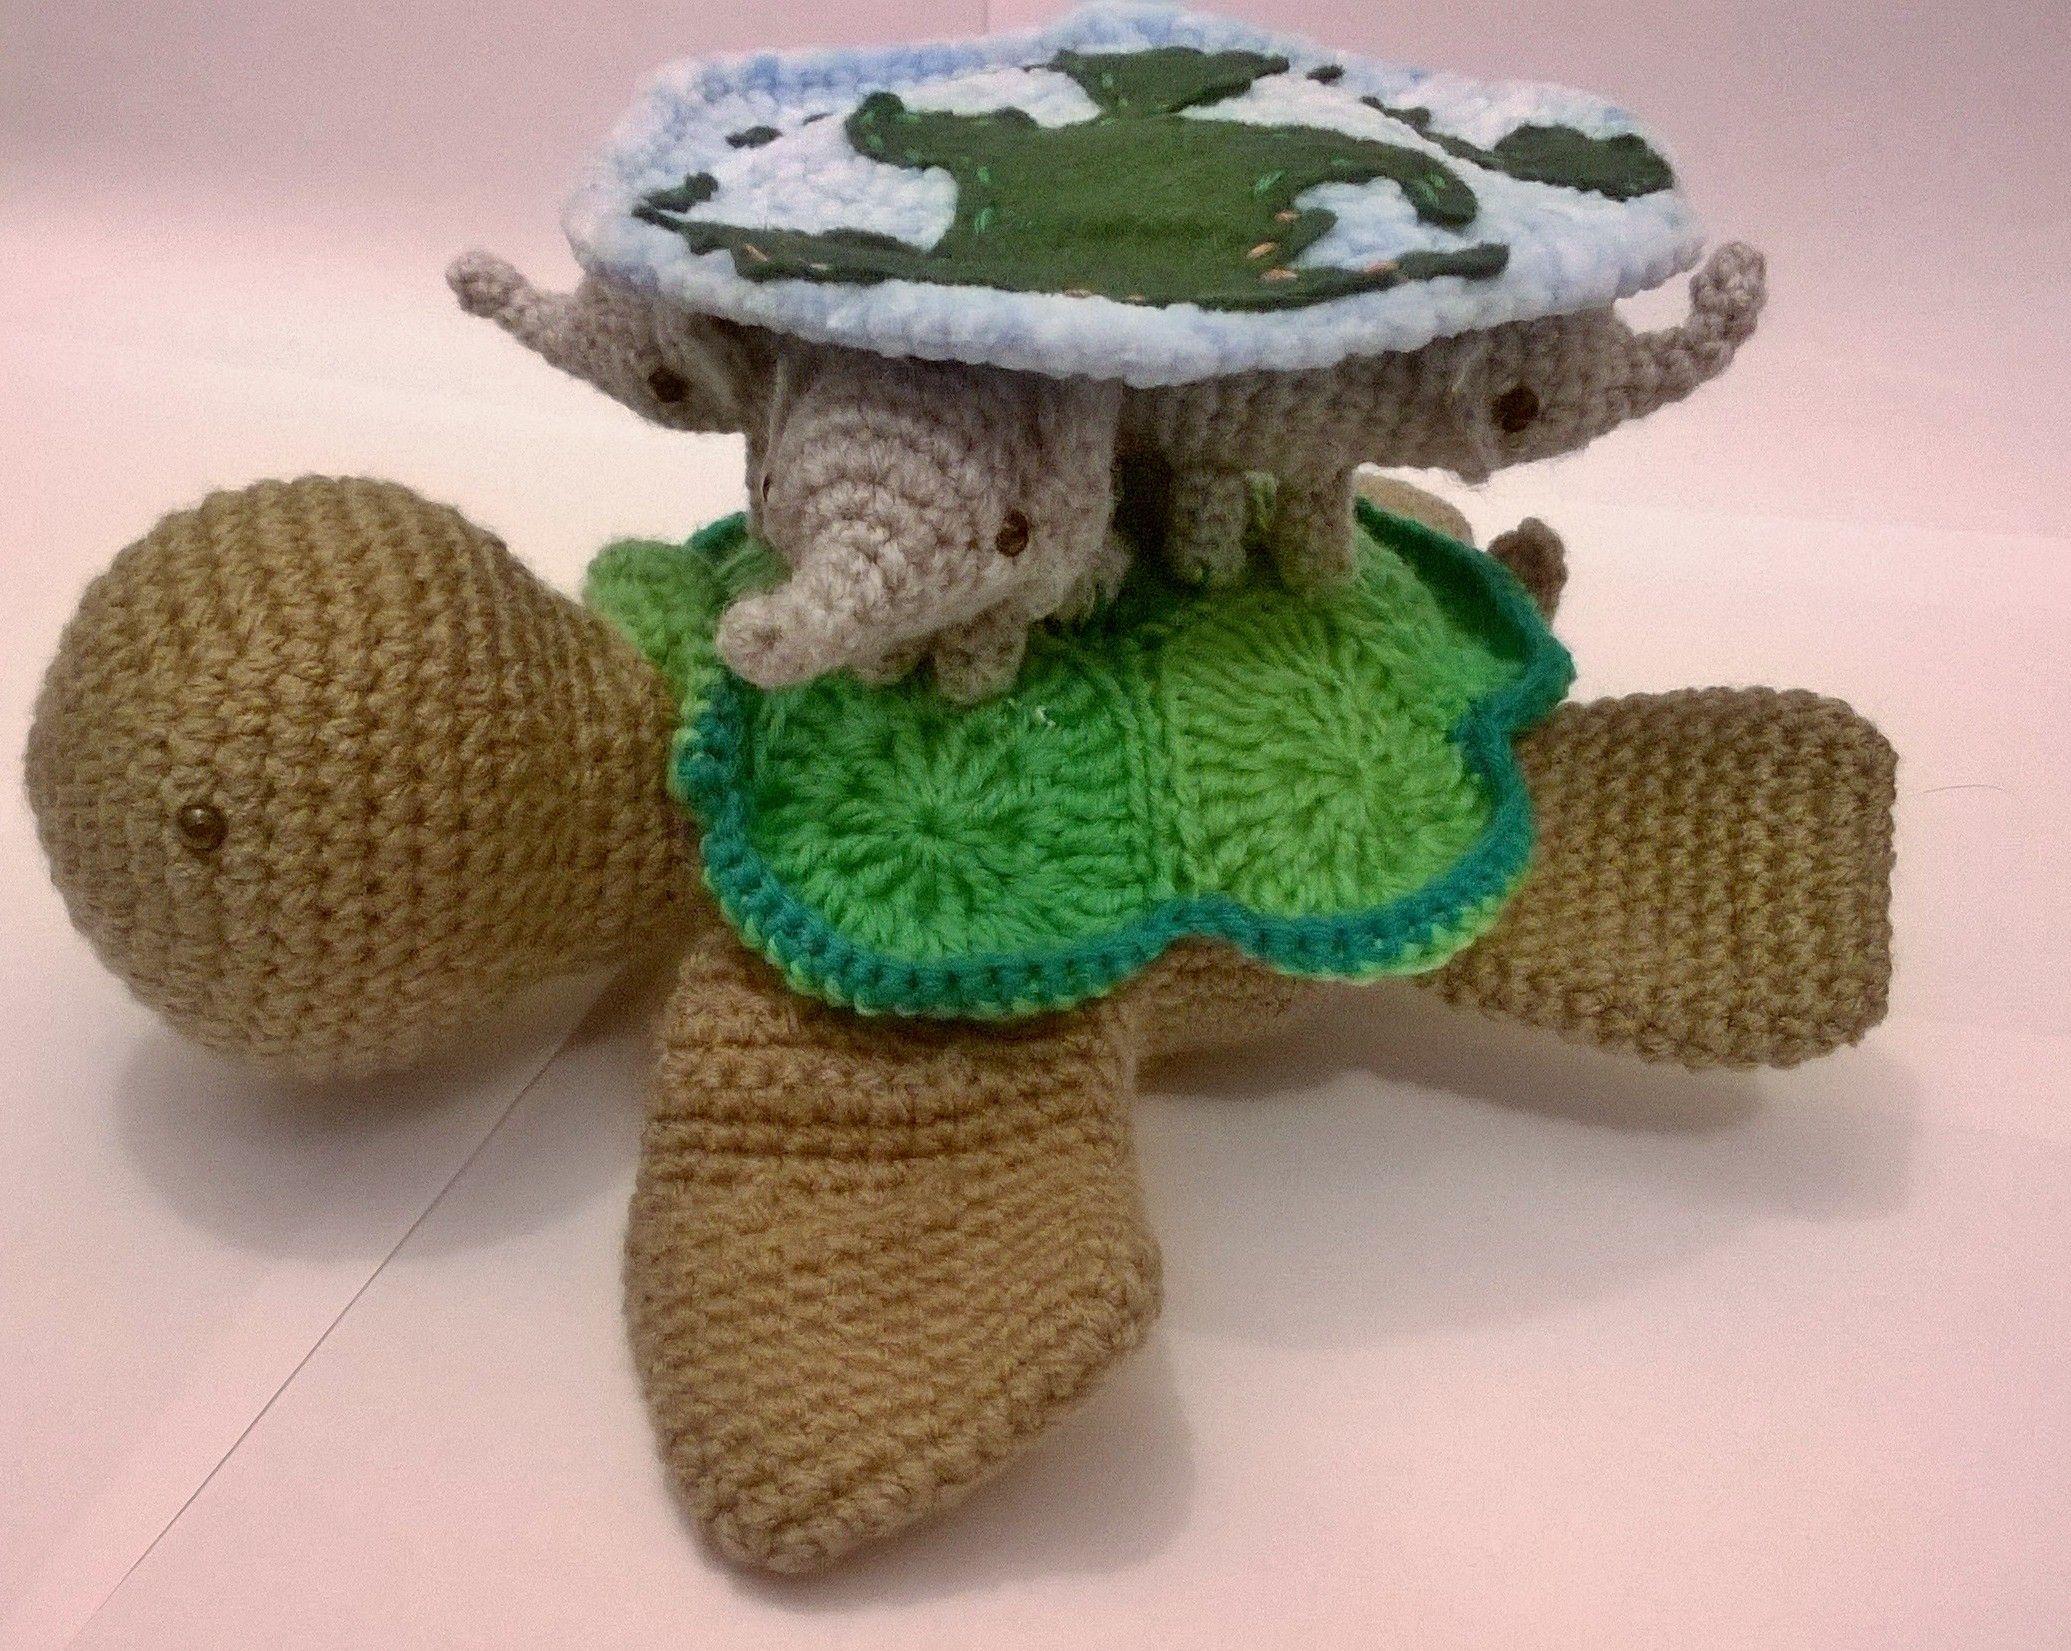 Amigurumi Vivi Free Patterns : Discworld free pattern crochet turtle elephant pattern and tuin